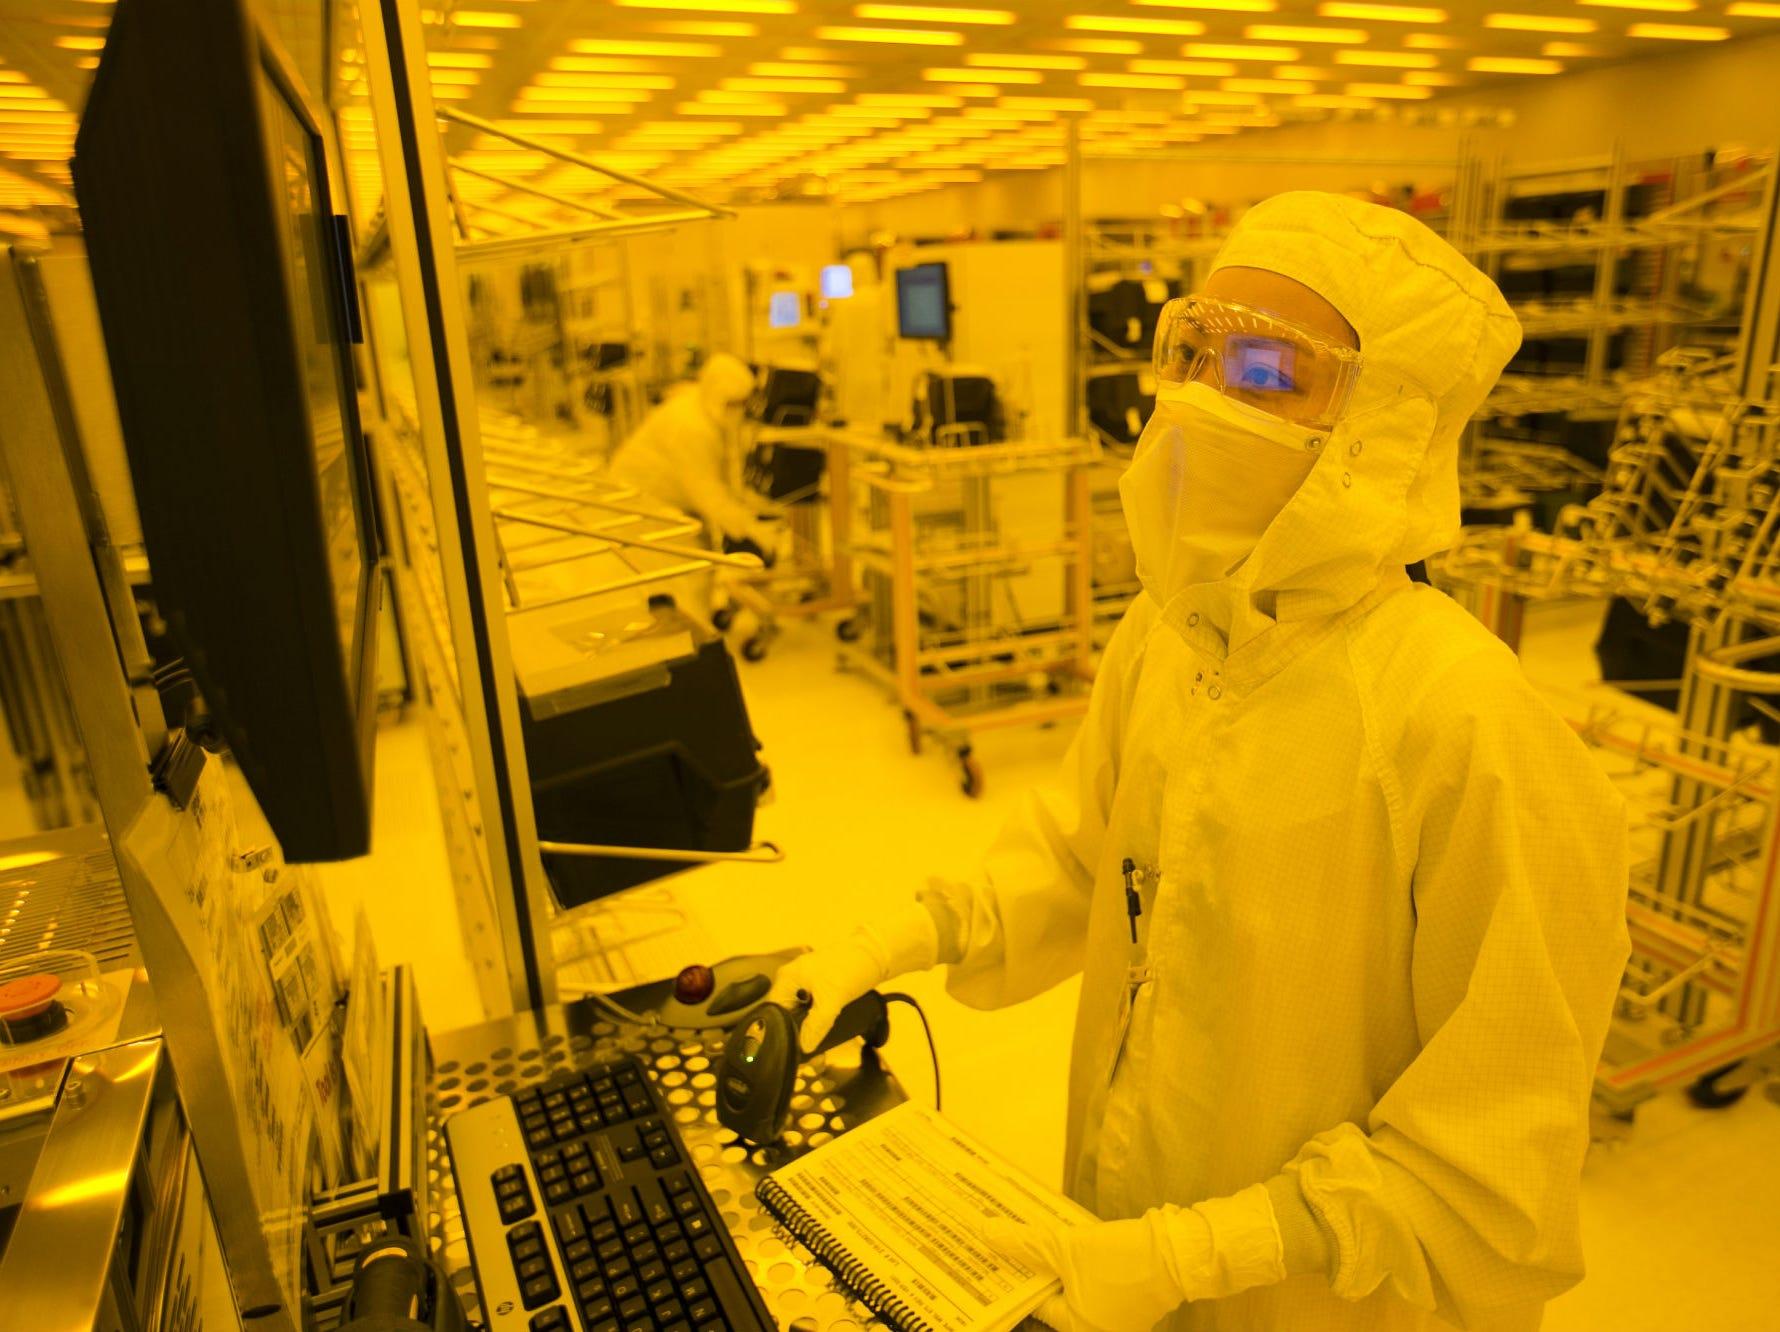 No. 87: Microchip Technology Inc. | Semiconductors, technology products | 2019 employees: 2,006 | 2018 employees: 1,888 | Ownership: Public | Headquarters: Chandler | www.microchip.com